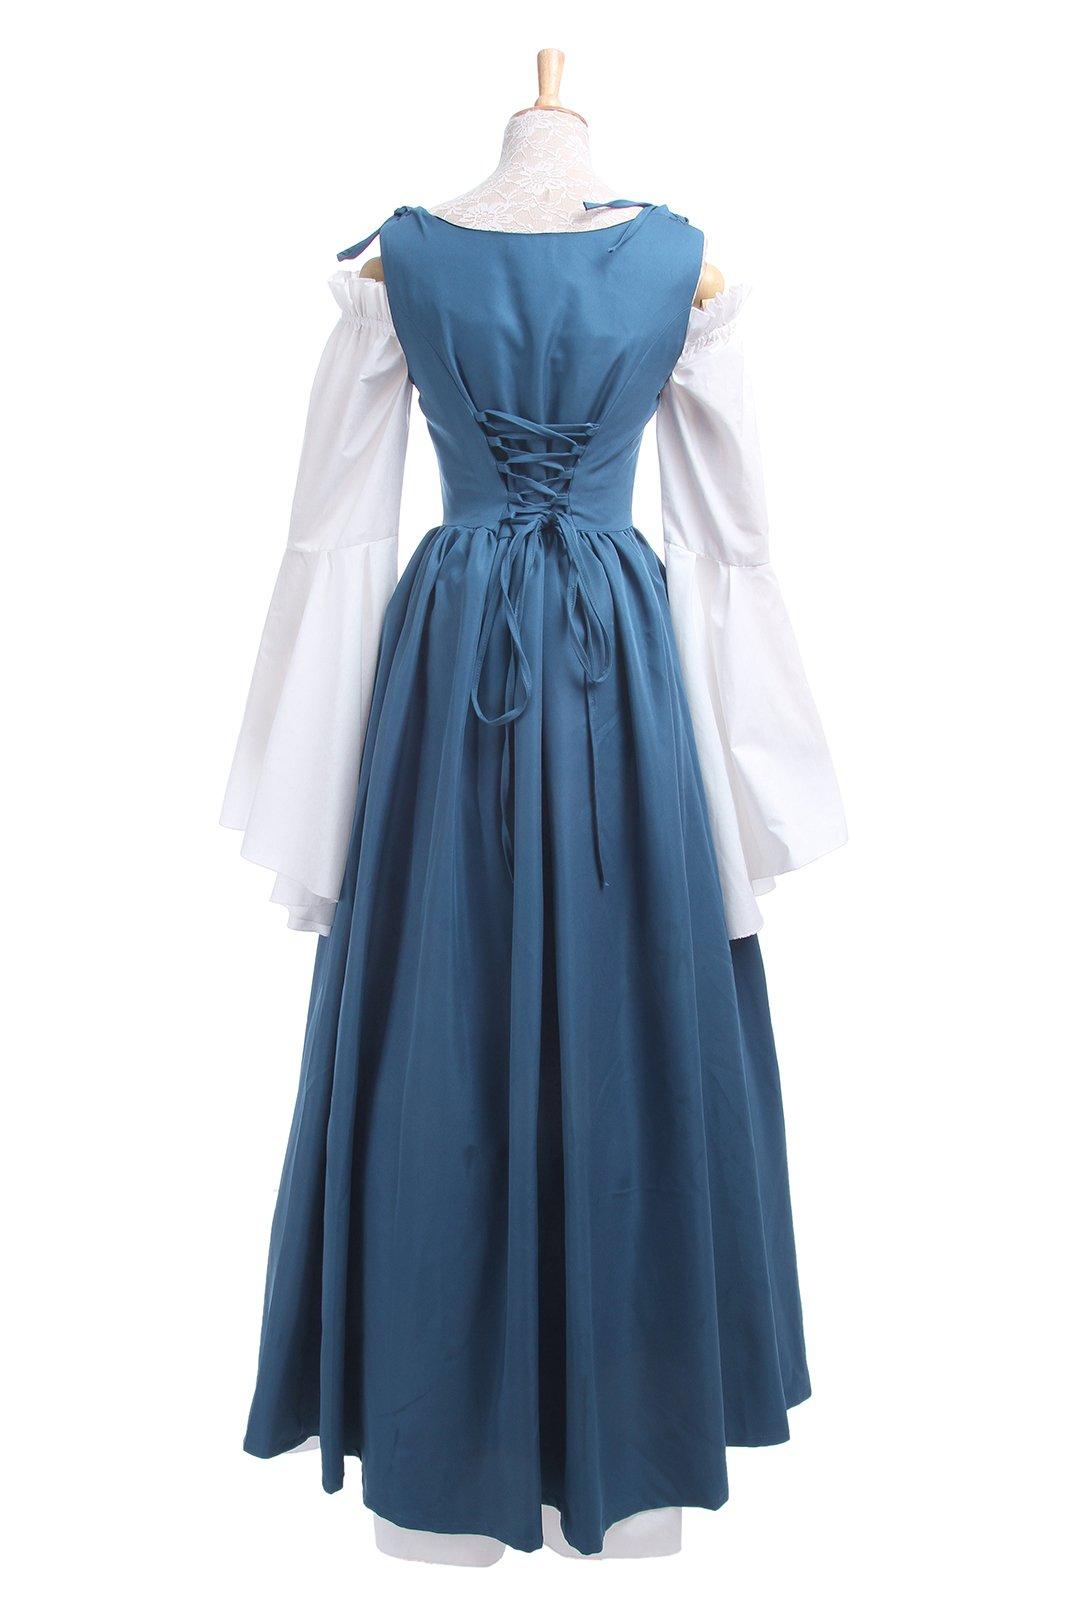 ROLECOS Womens Renaissance Medieval Irish Costume Boho Underdress Overdress Coat Light Blue L by ROLECOS (Image #7)